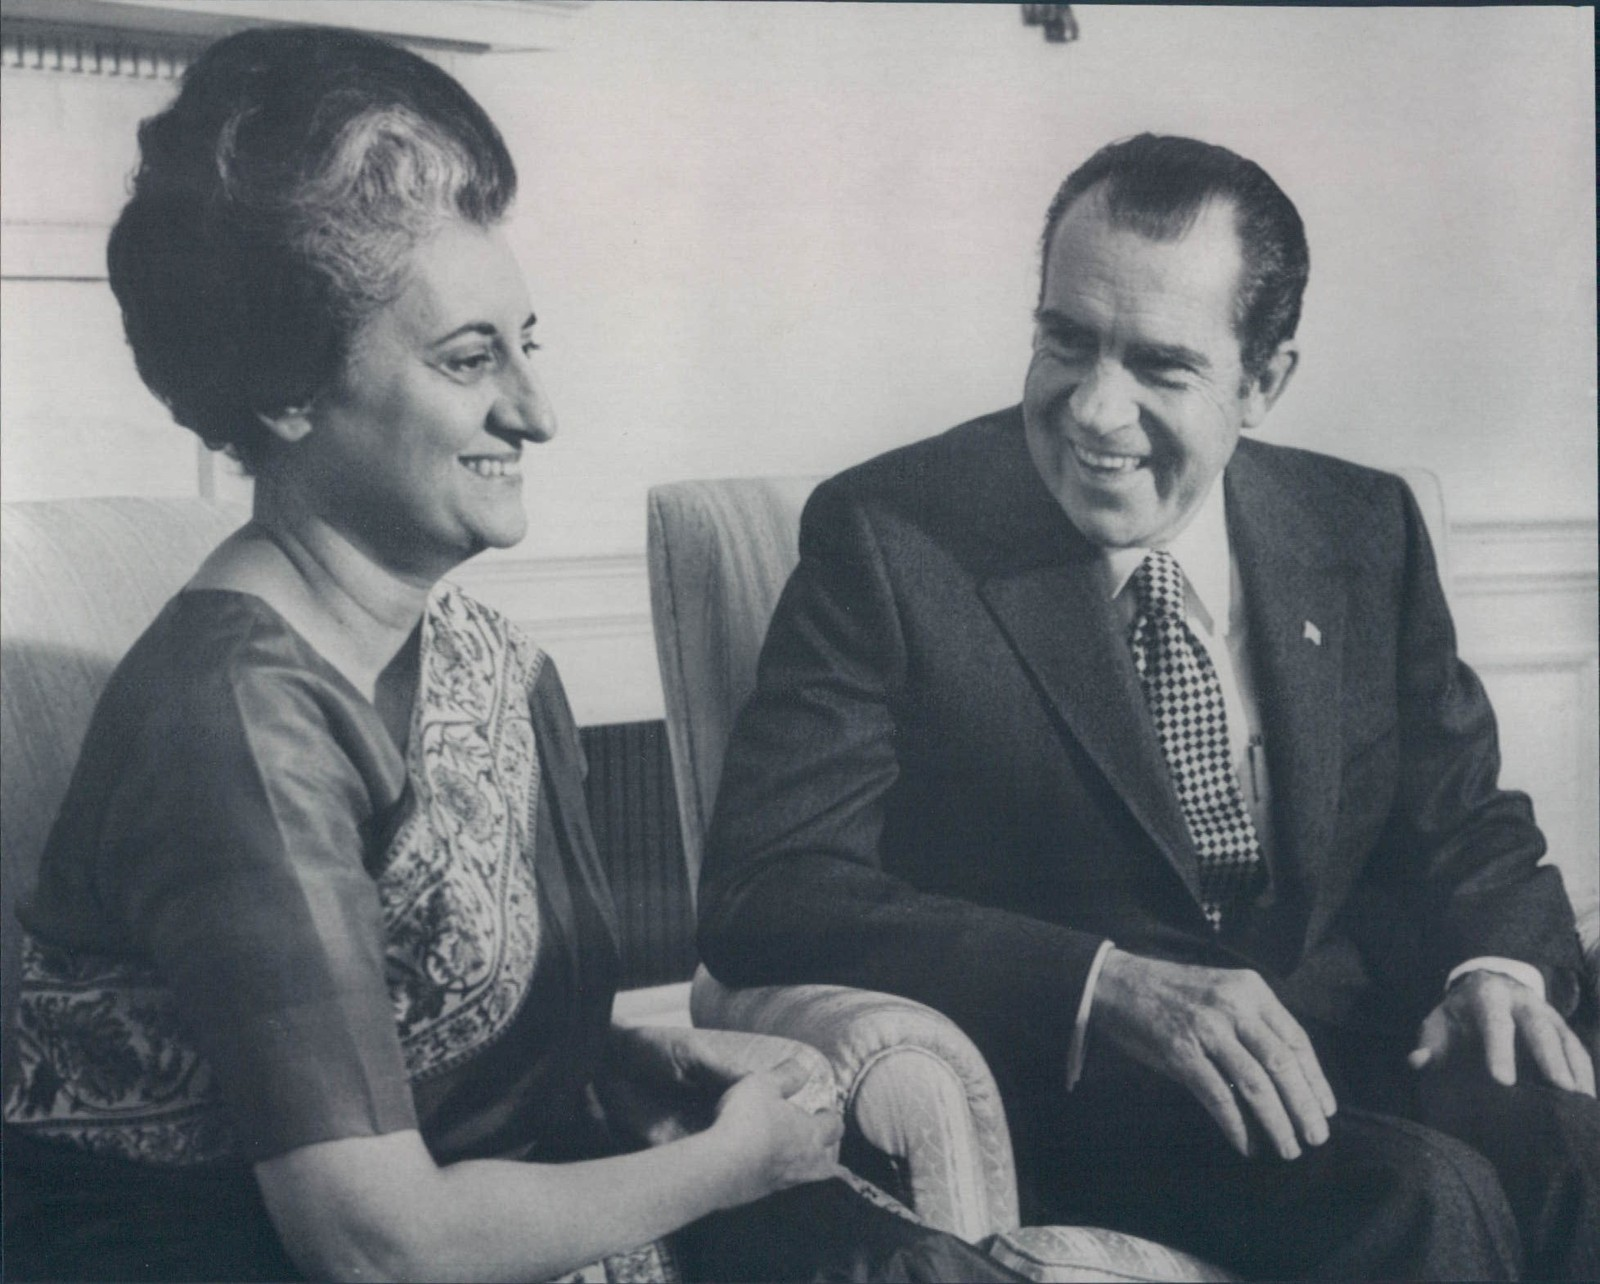 Indian Prime Minister Indira Gandhi and US President Richard Nixon - 1971